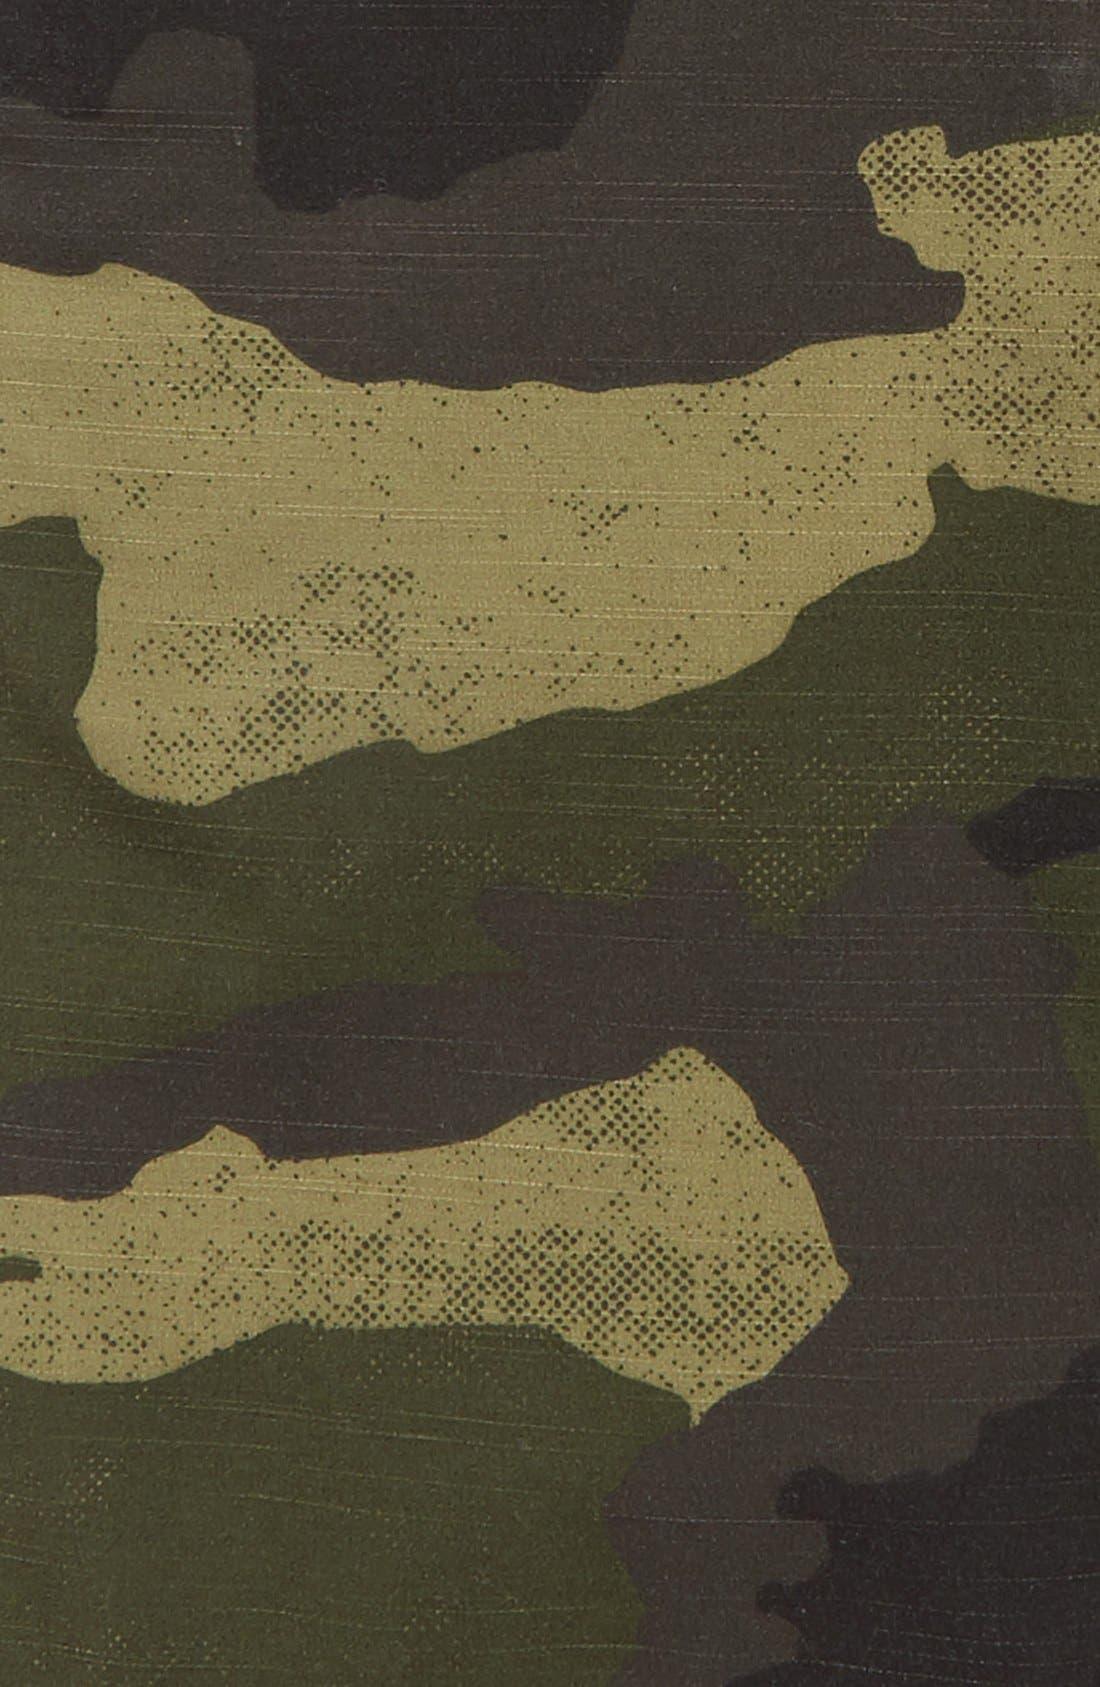 Camo Hybrid Shorts,                             Alternate thumbnail 4, color,                             Light Army